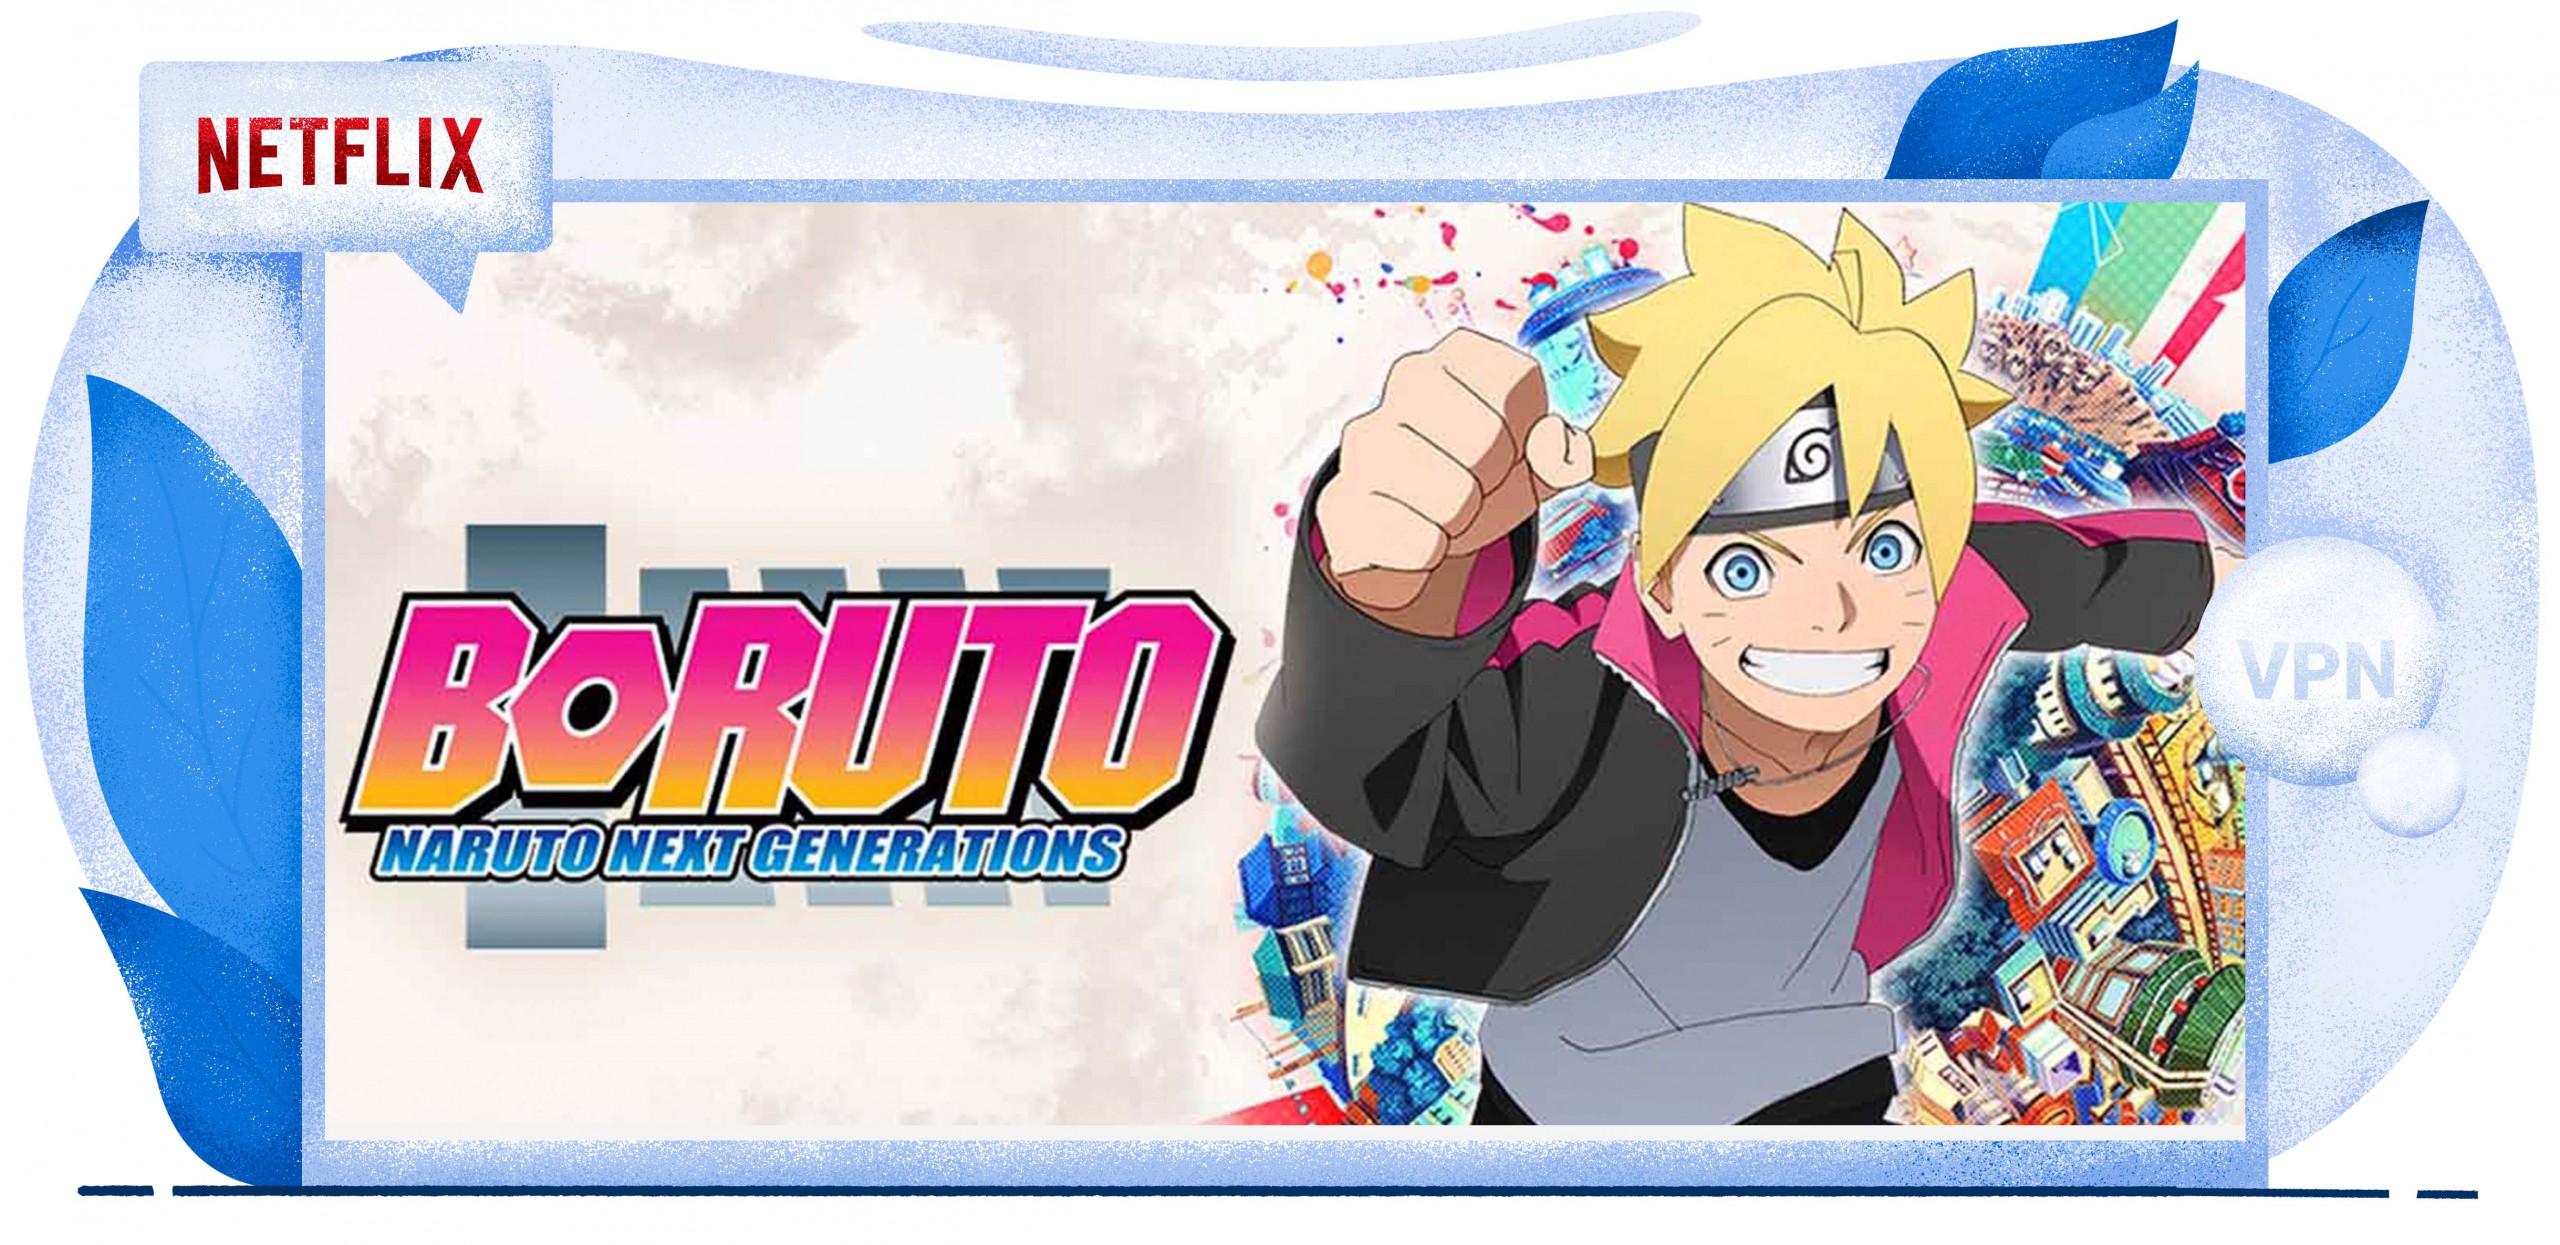 Netflix streamt Boruto: Naruto Next Generation in Frankreich